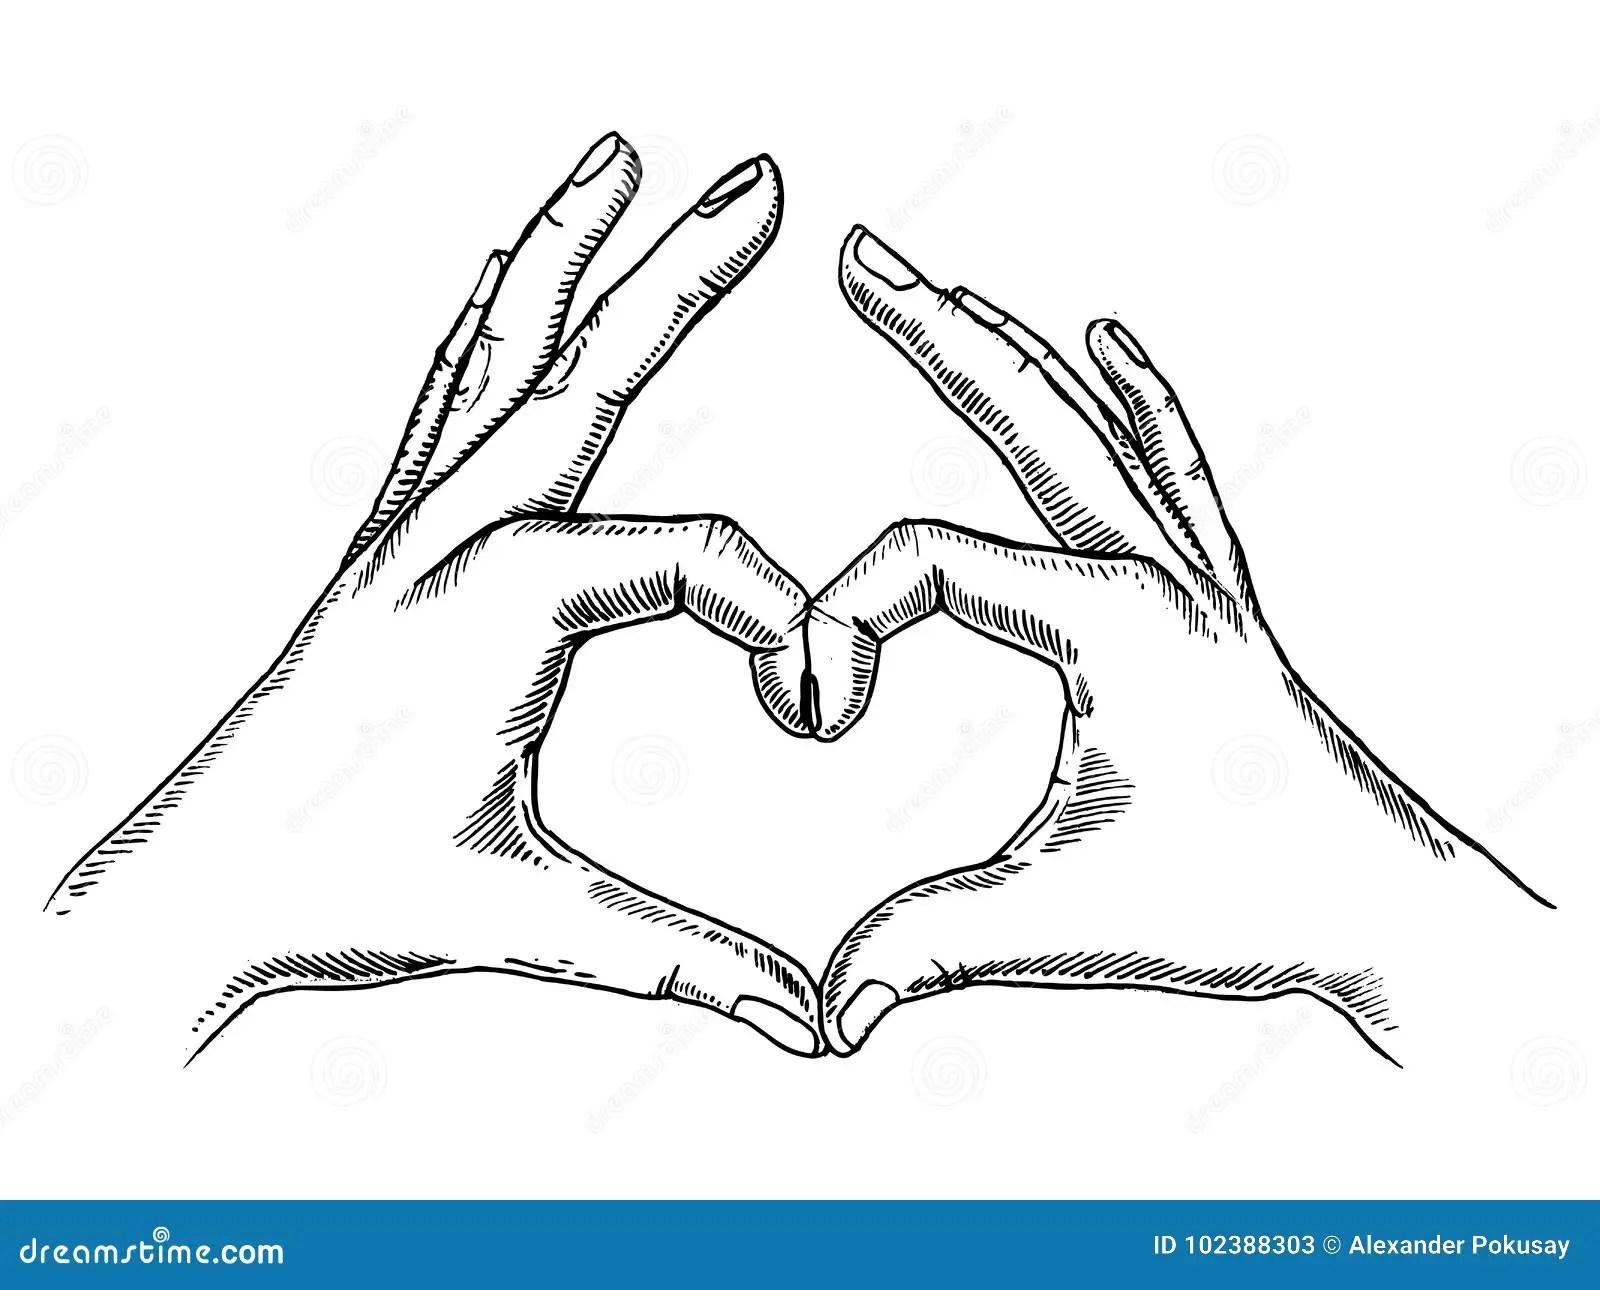 Hands Making Heart Sign Engraving Vector Stock Vector